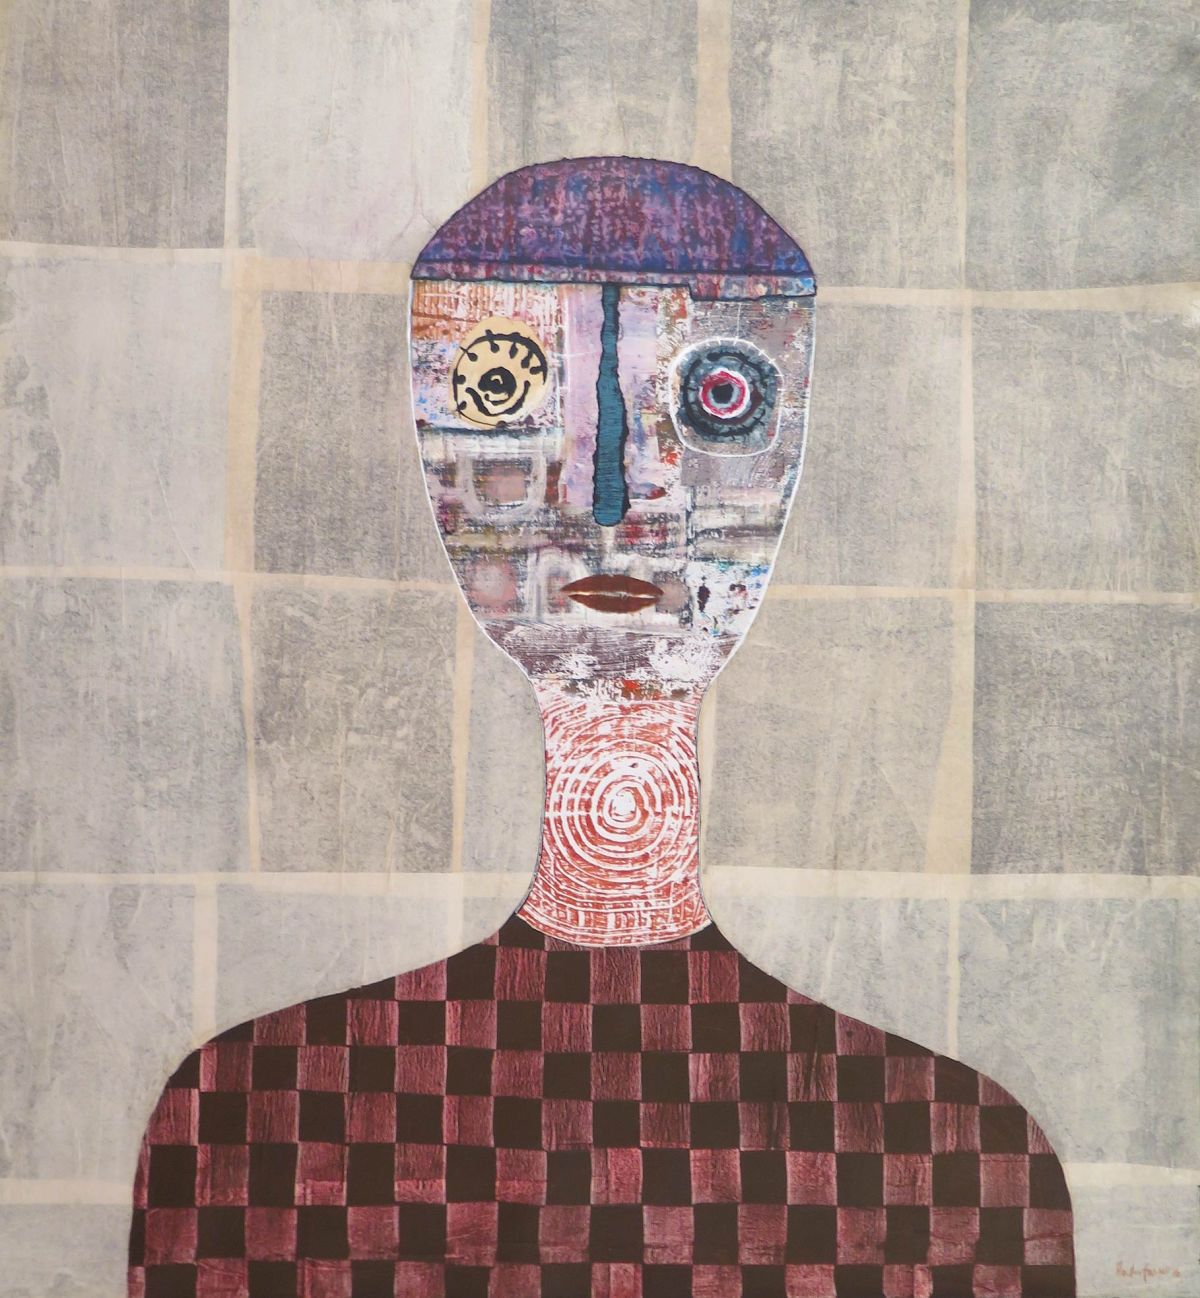 bryant-toth-fine-art-hector-frank-exhibition-1